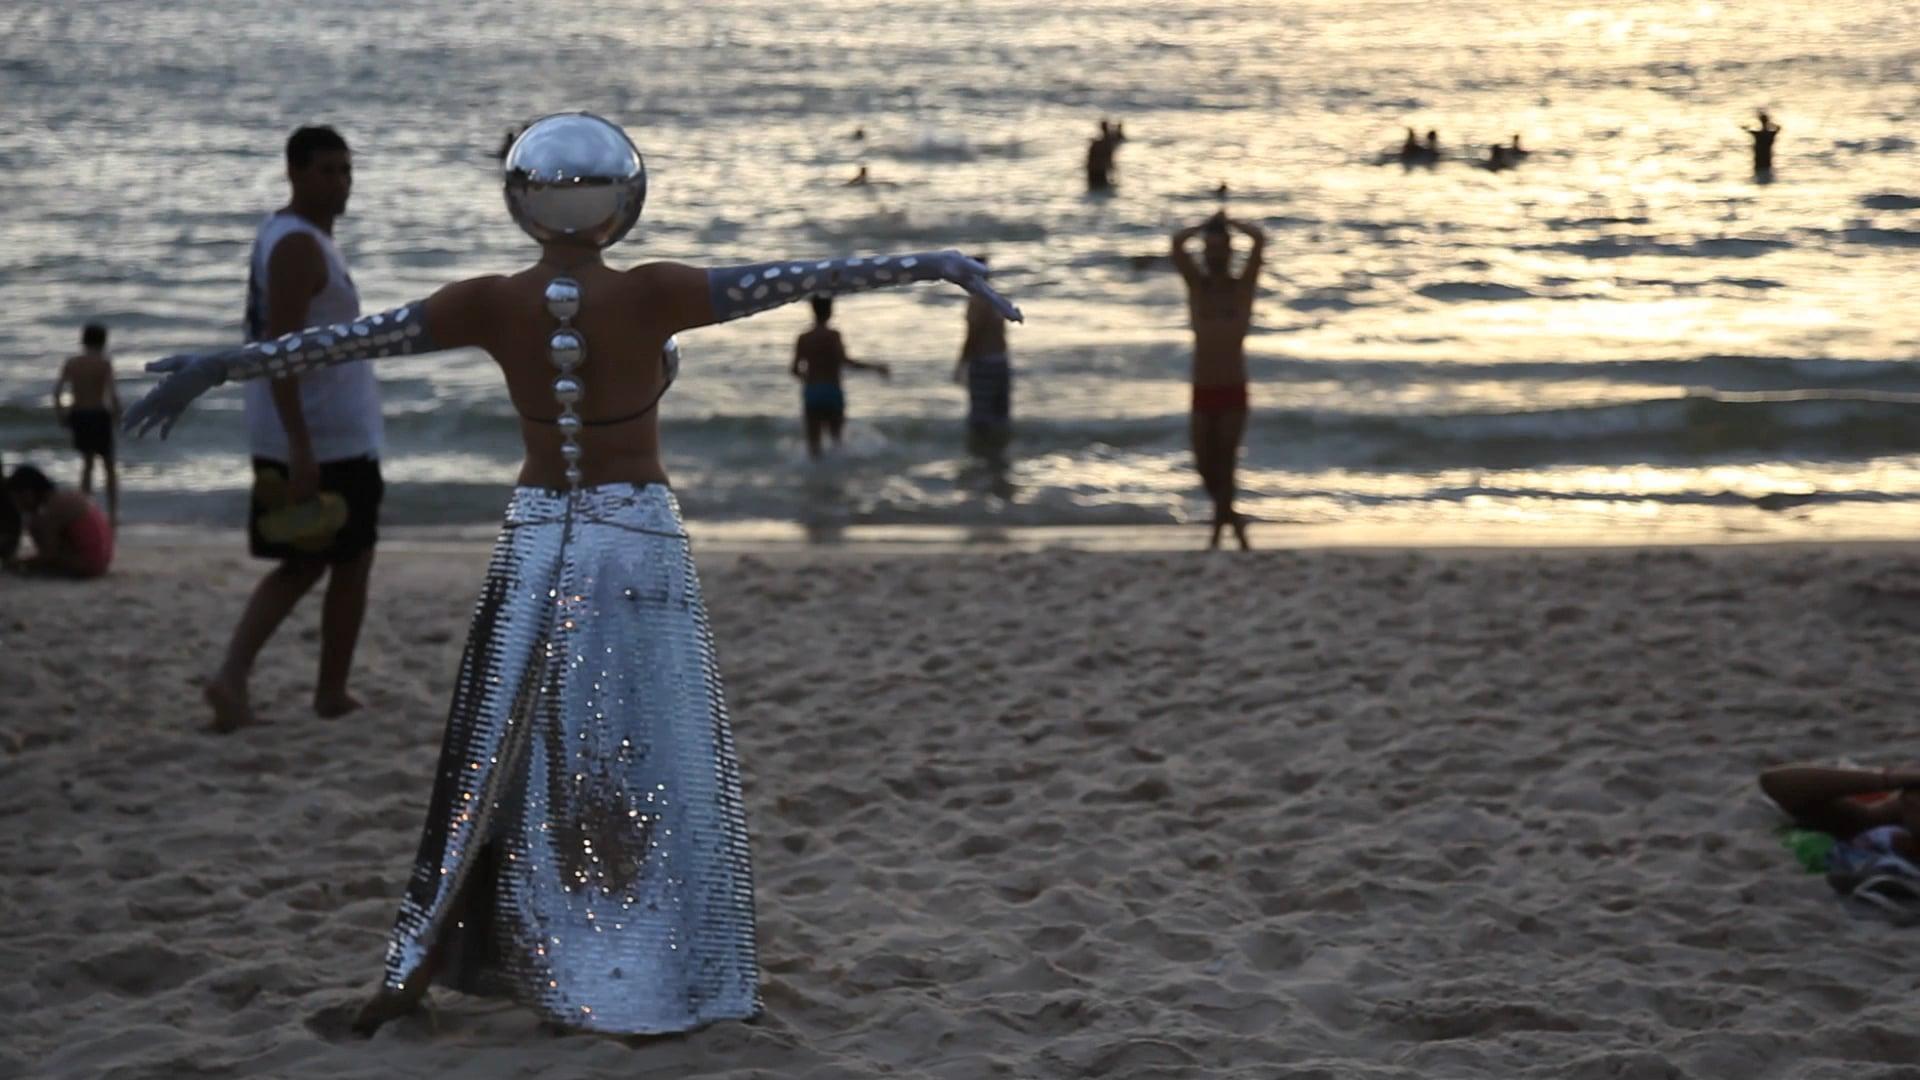 #TakeaSelfieOnMe / #TireUmaSelfieEmMim - Rio de Janeiro